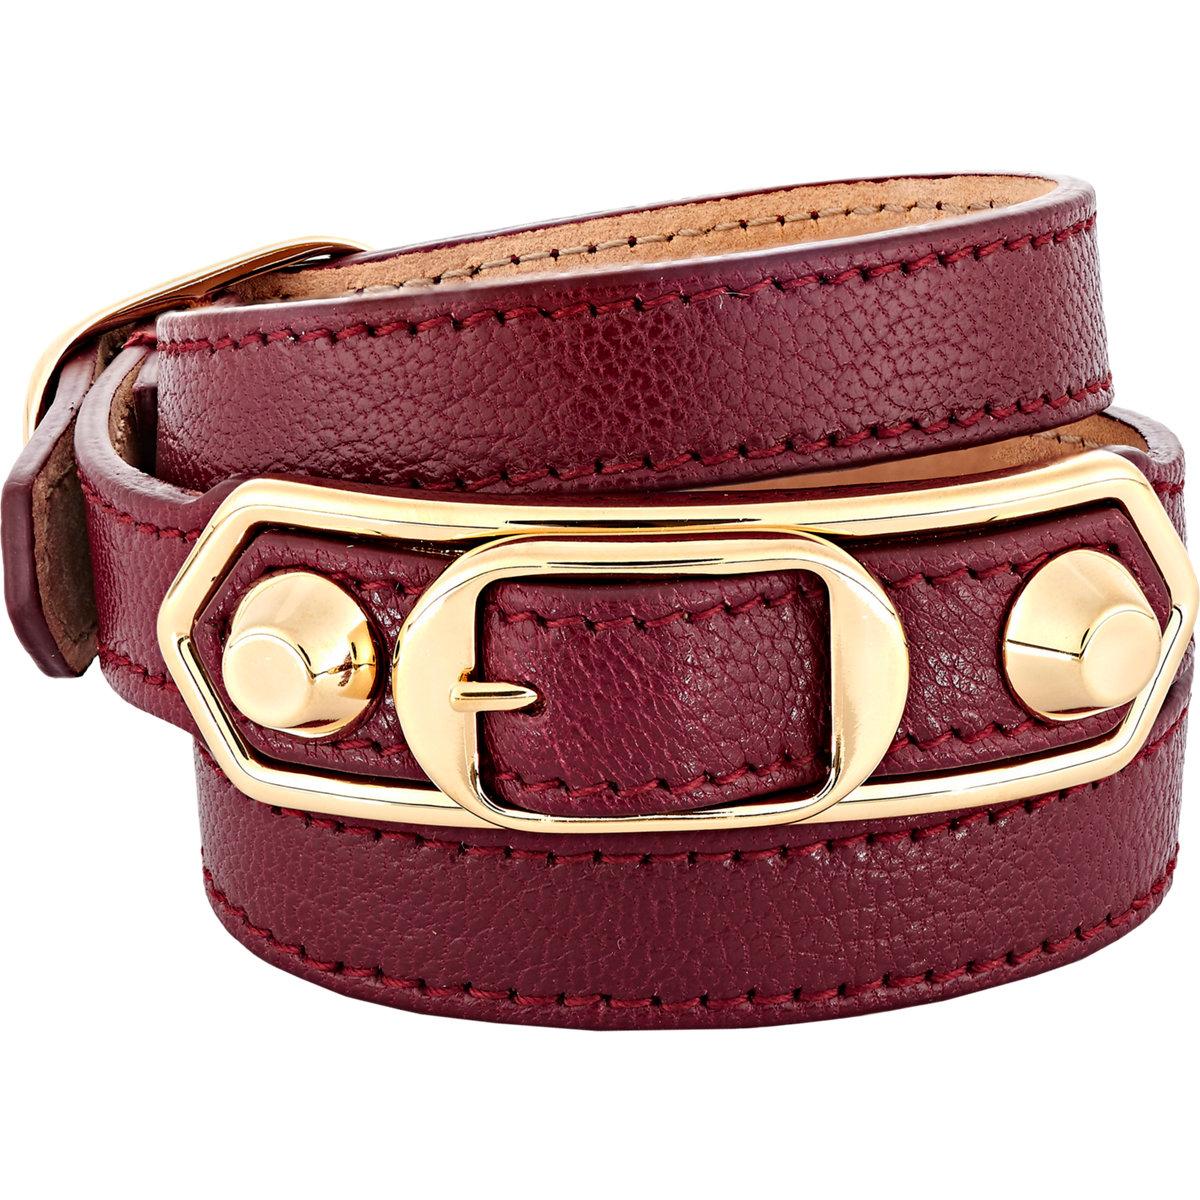 0bb9f15d60d33 Lyst - Balenciaga Metallic Edge Double Tour Wrap Bracelet in Red